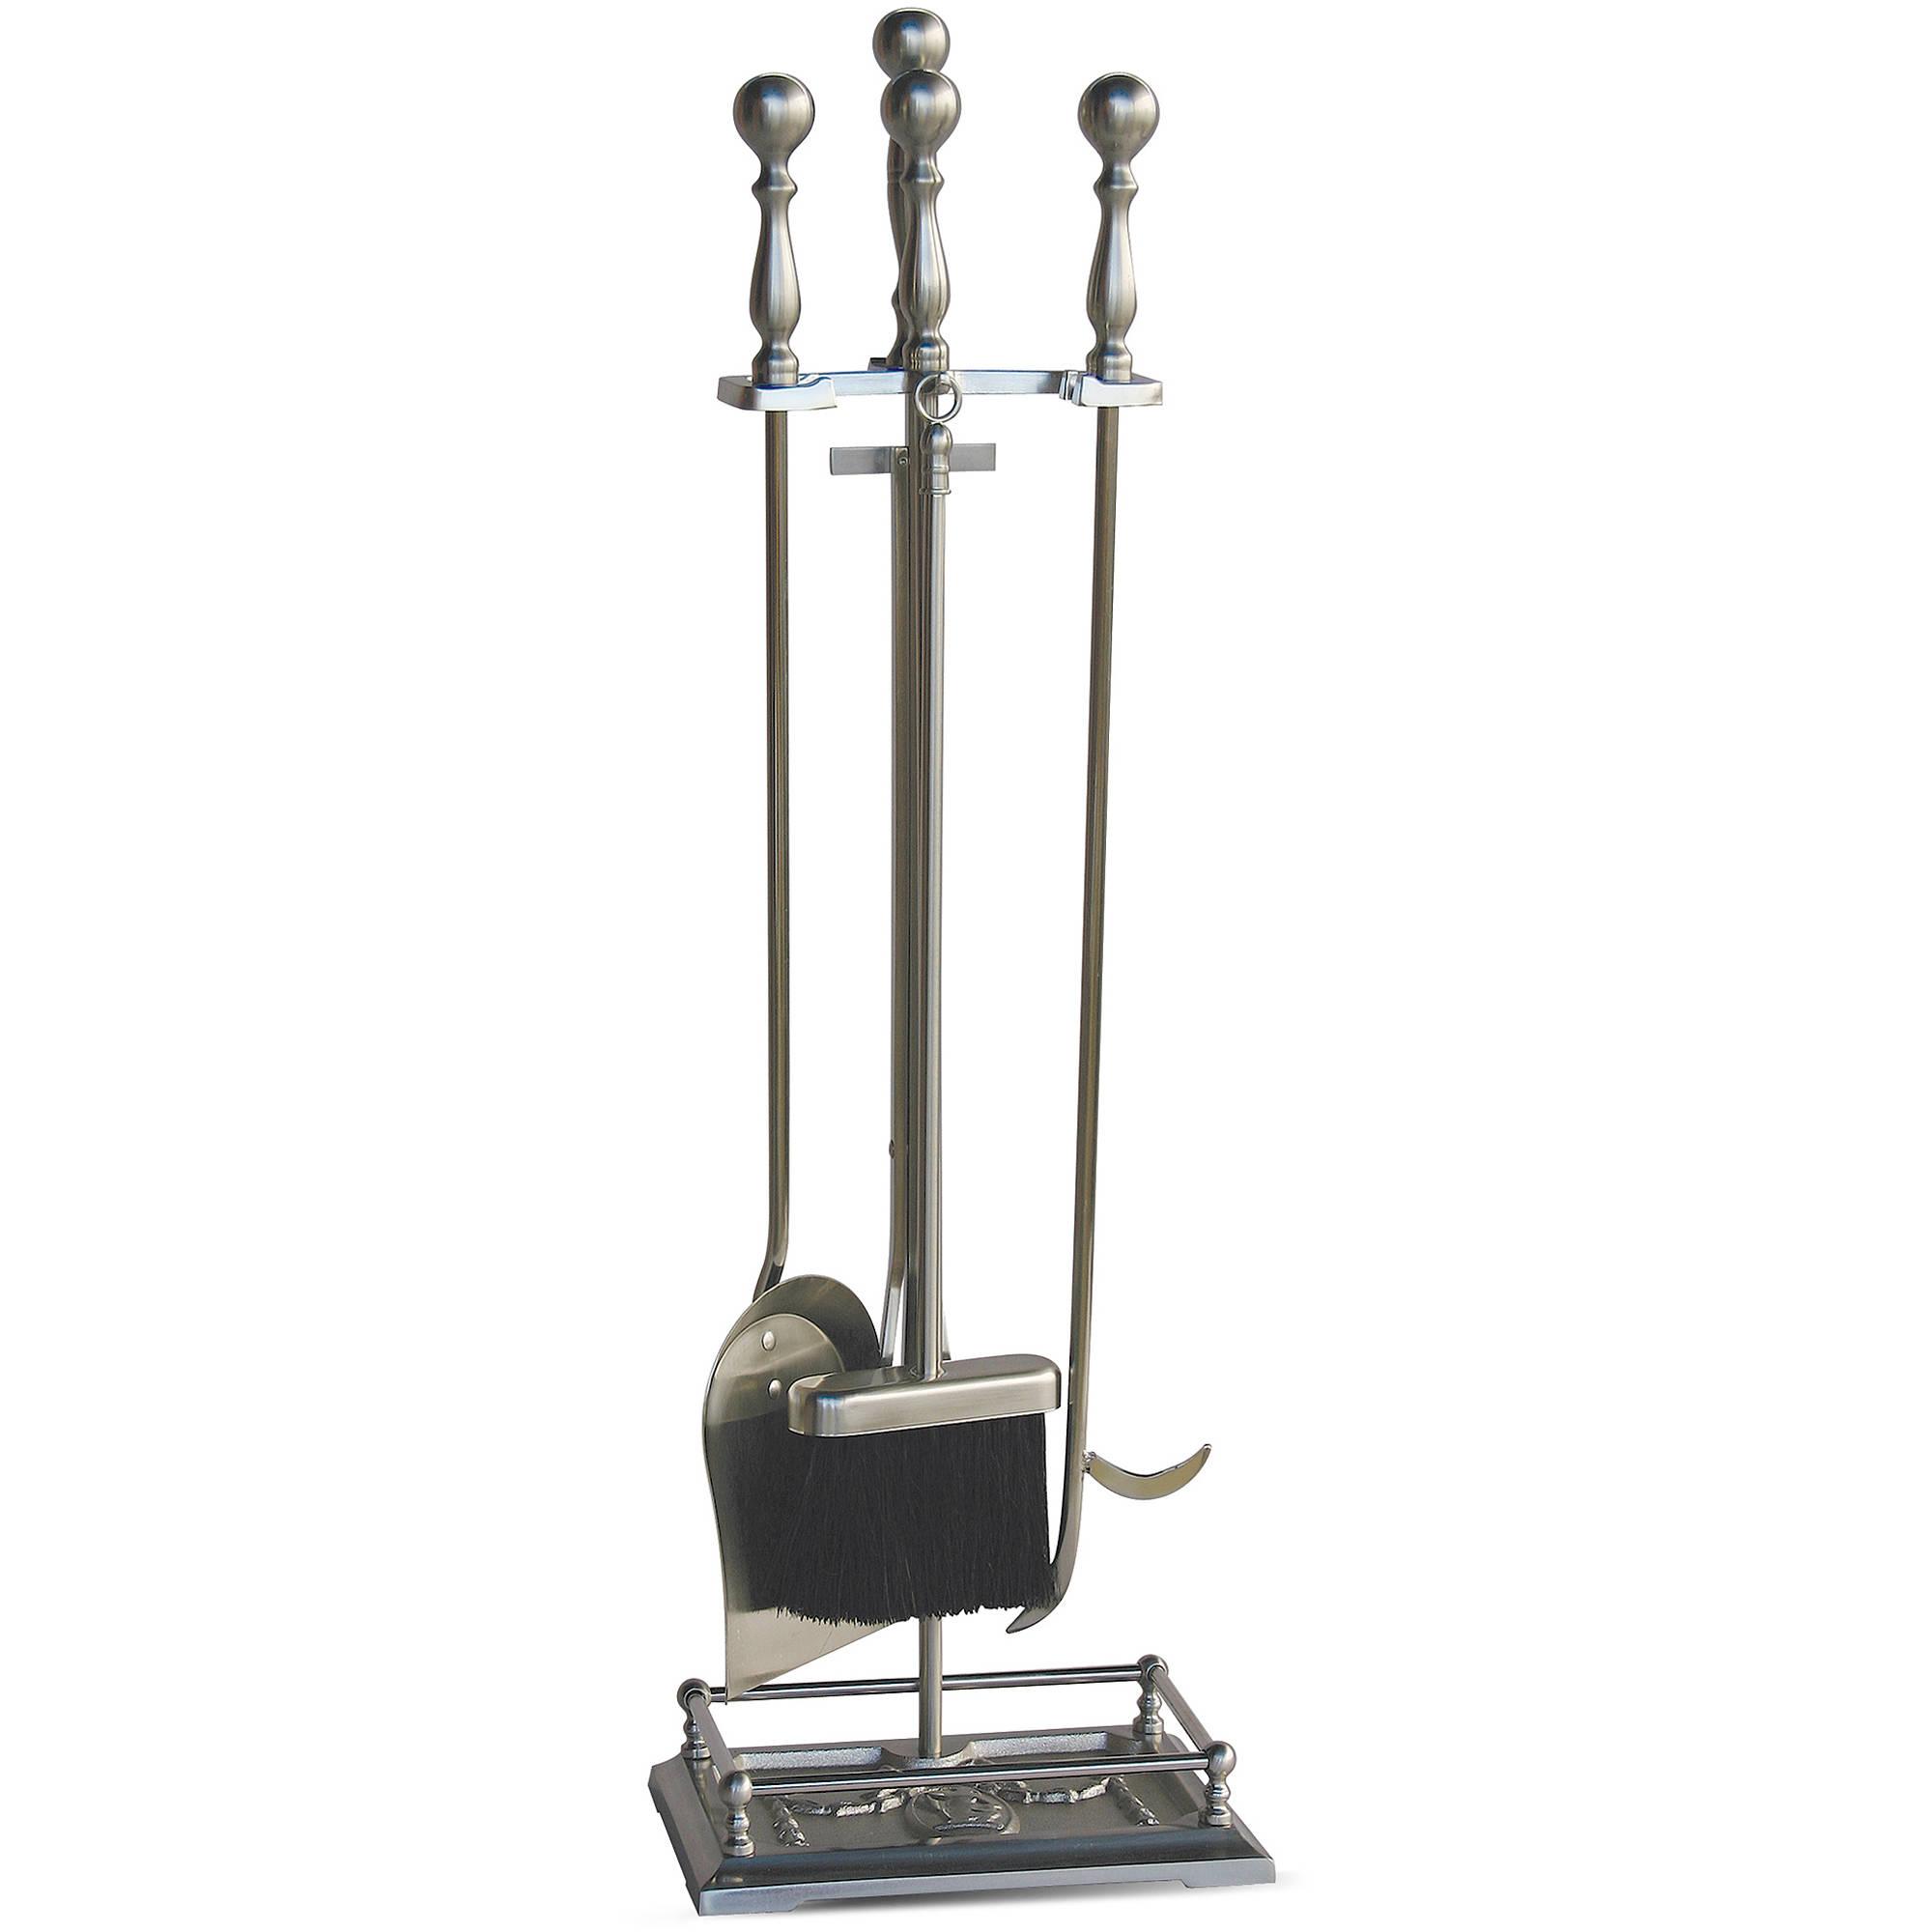 Walmart Fireplace Accessories Part - 25: UniFlame 5-Piece Fireplace Tool Set, Satin Pewter - Walmart.com